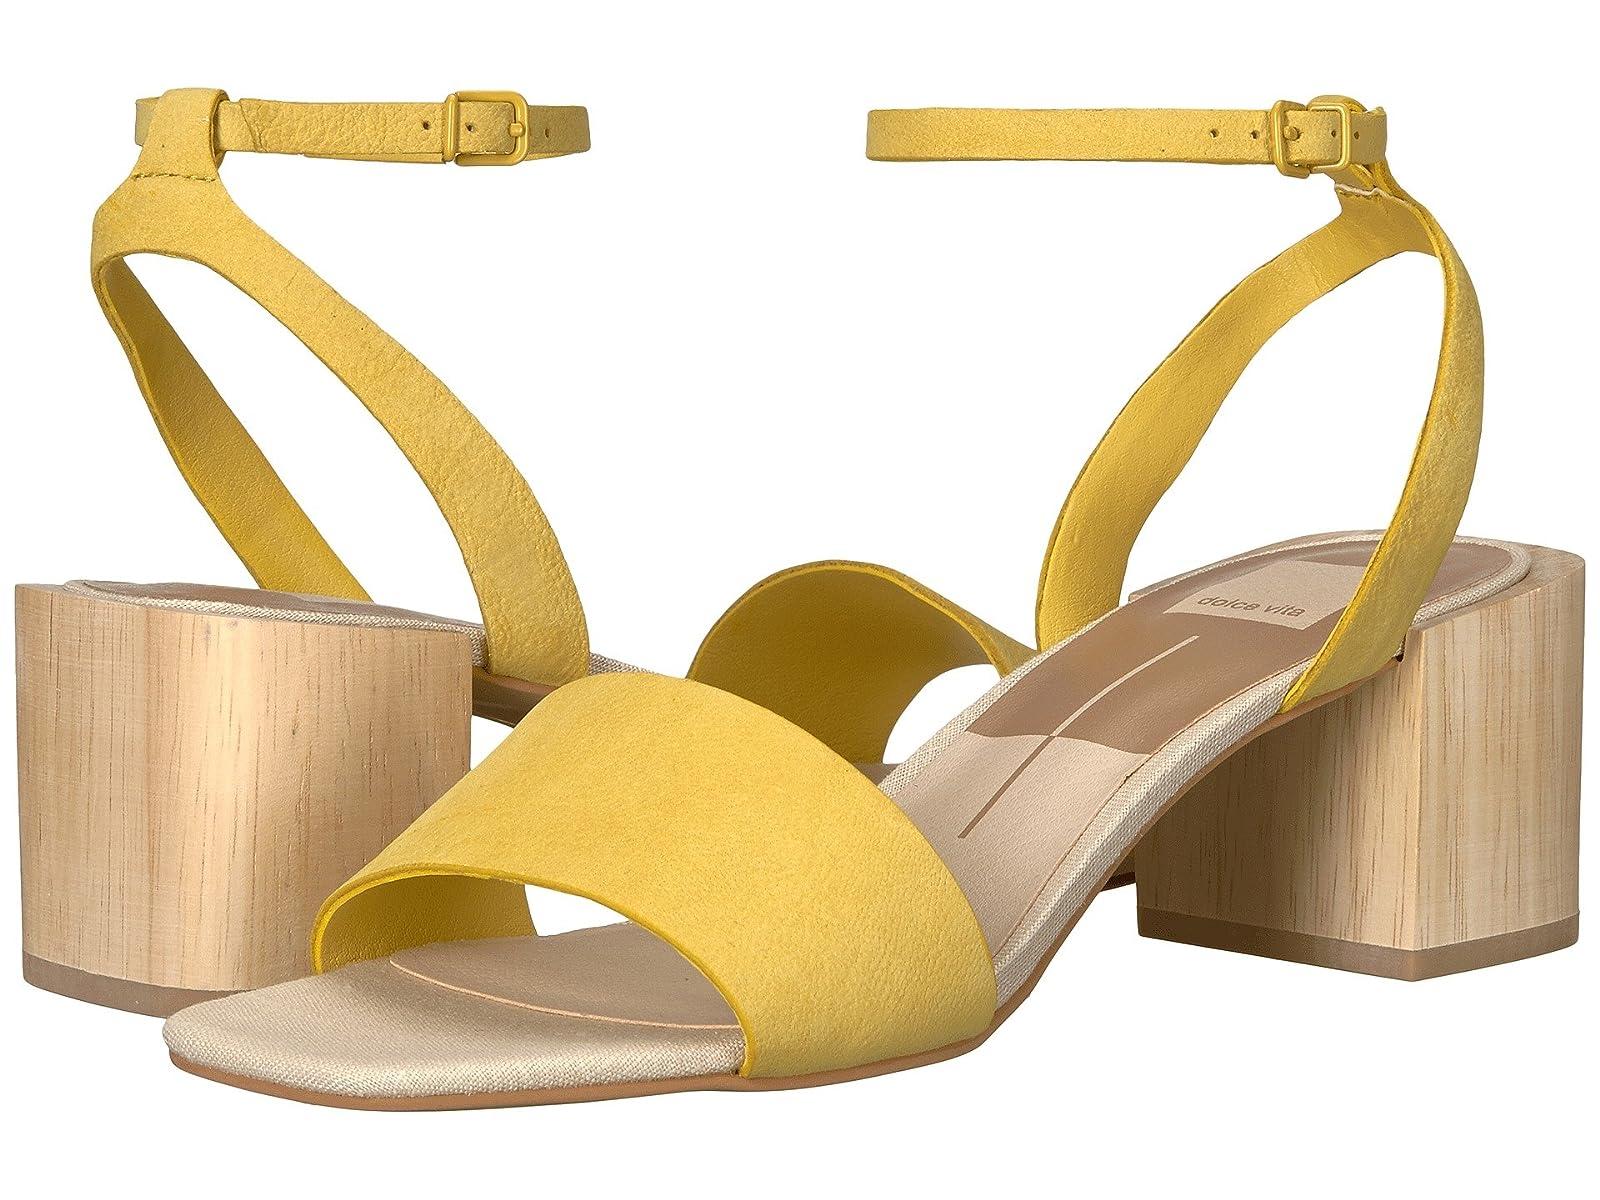 Dolce Vita ZaritaAtmospheric grades have affordable shoes